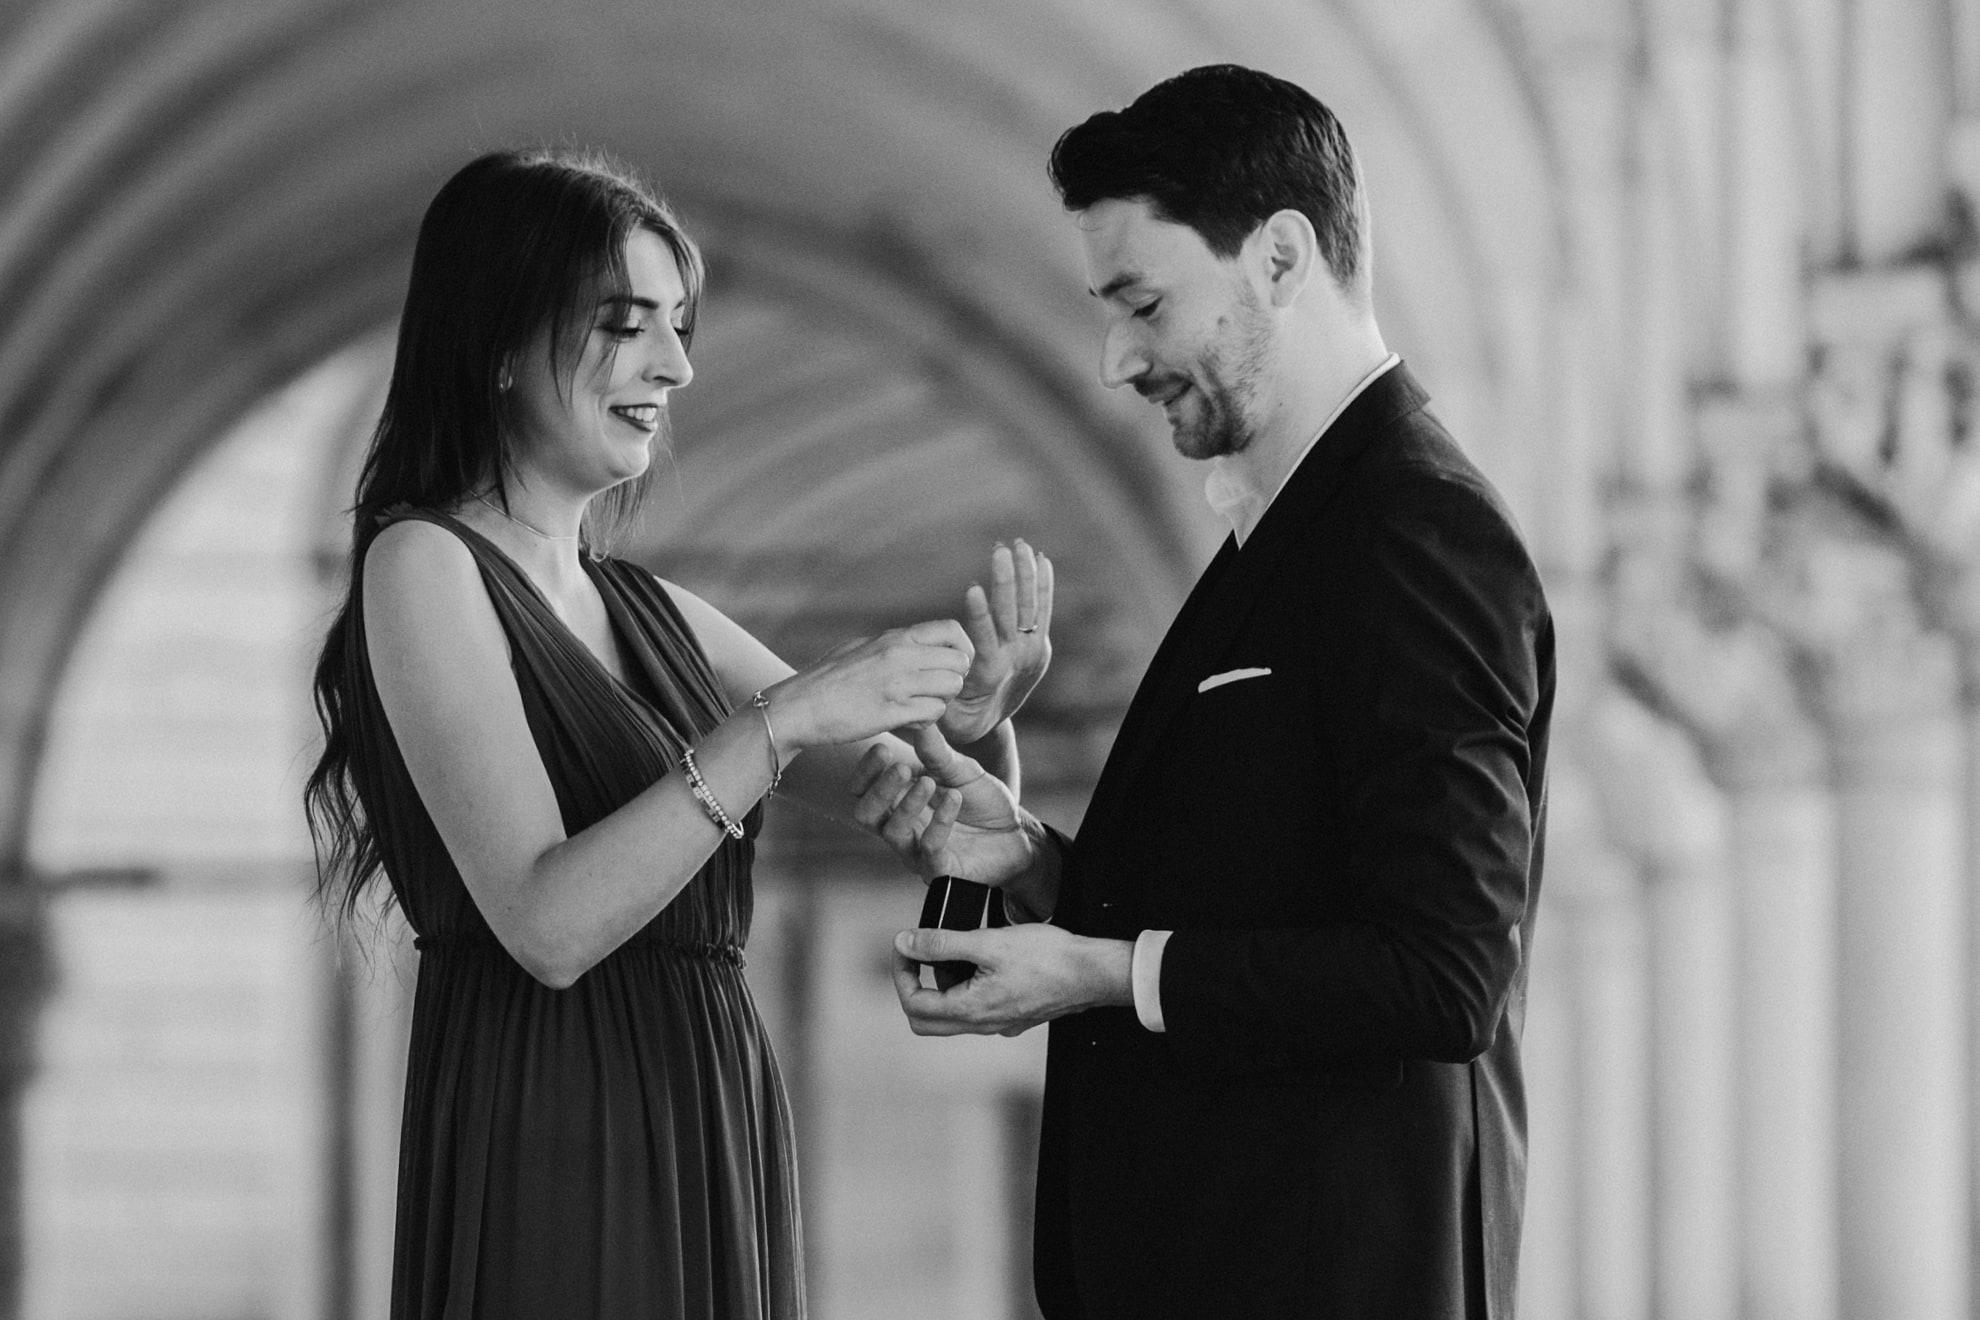 engagement venice venezia proposal proposta matrimonio fidanzamento irene pollacchi fotografa 29